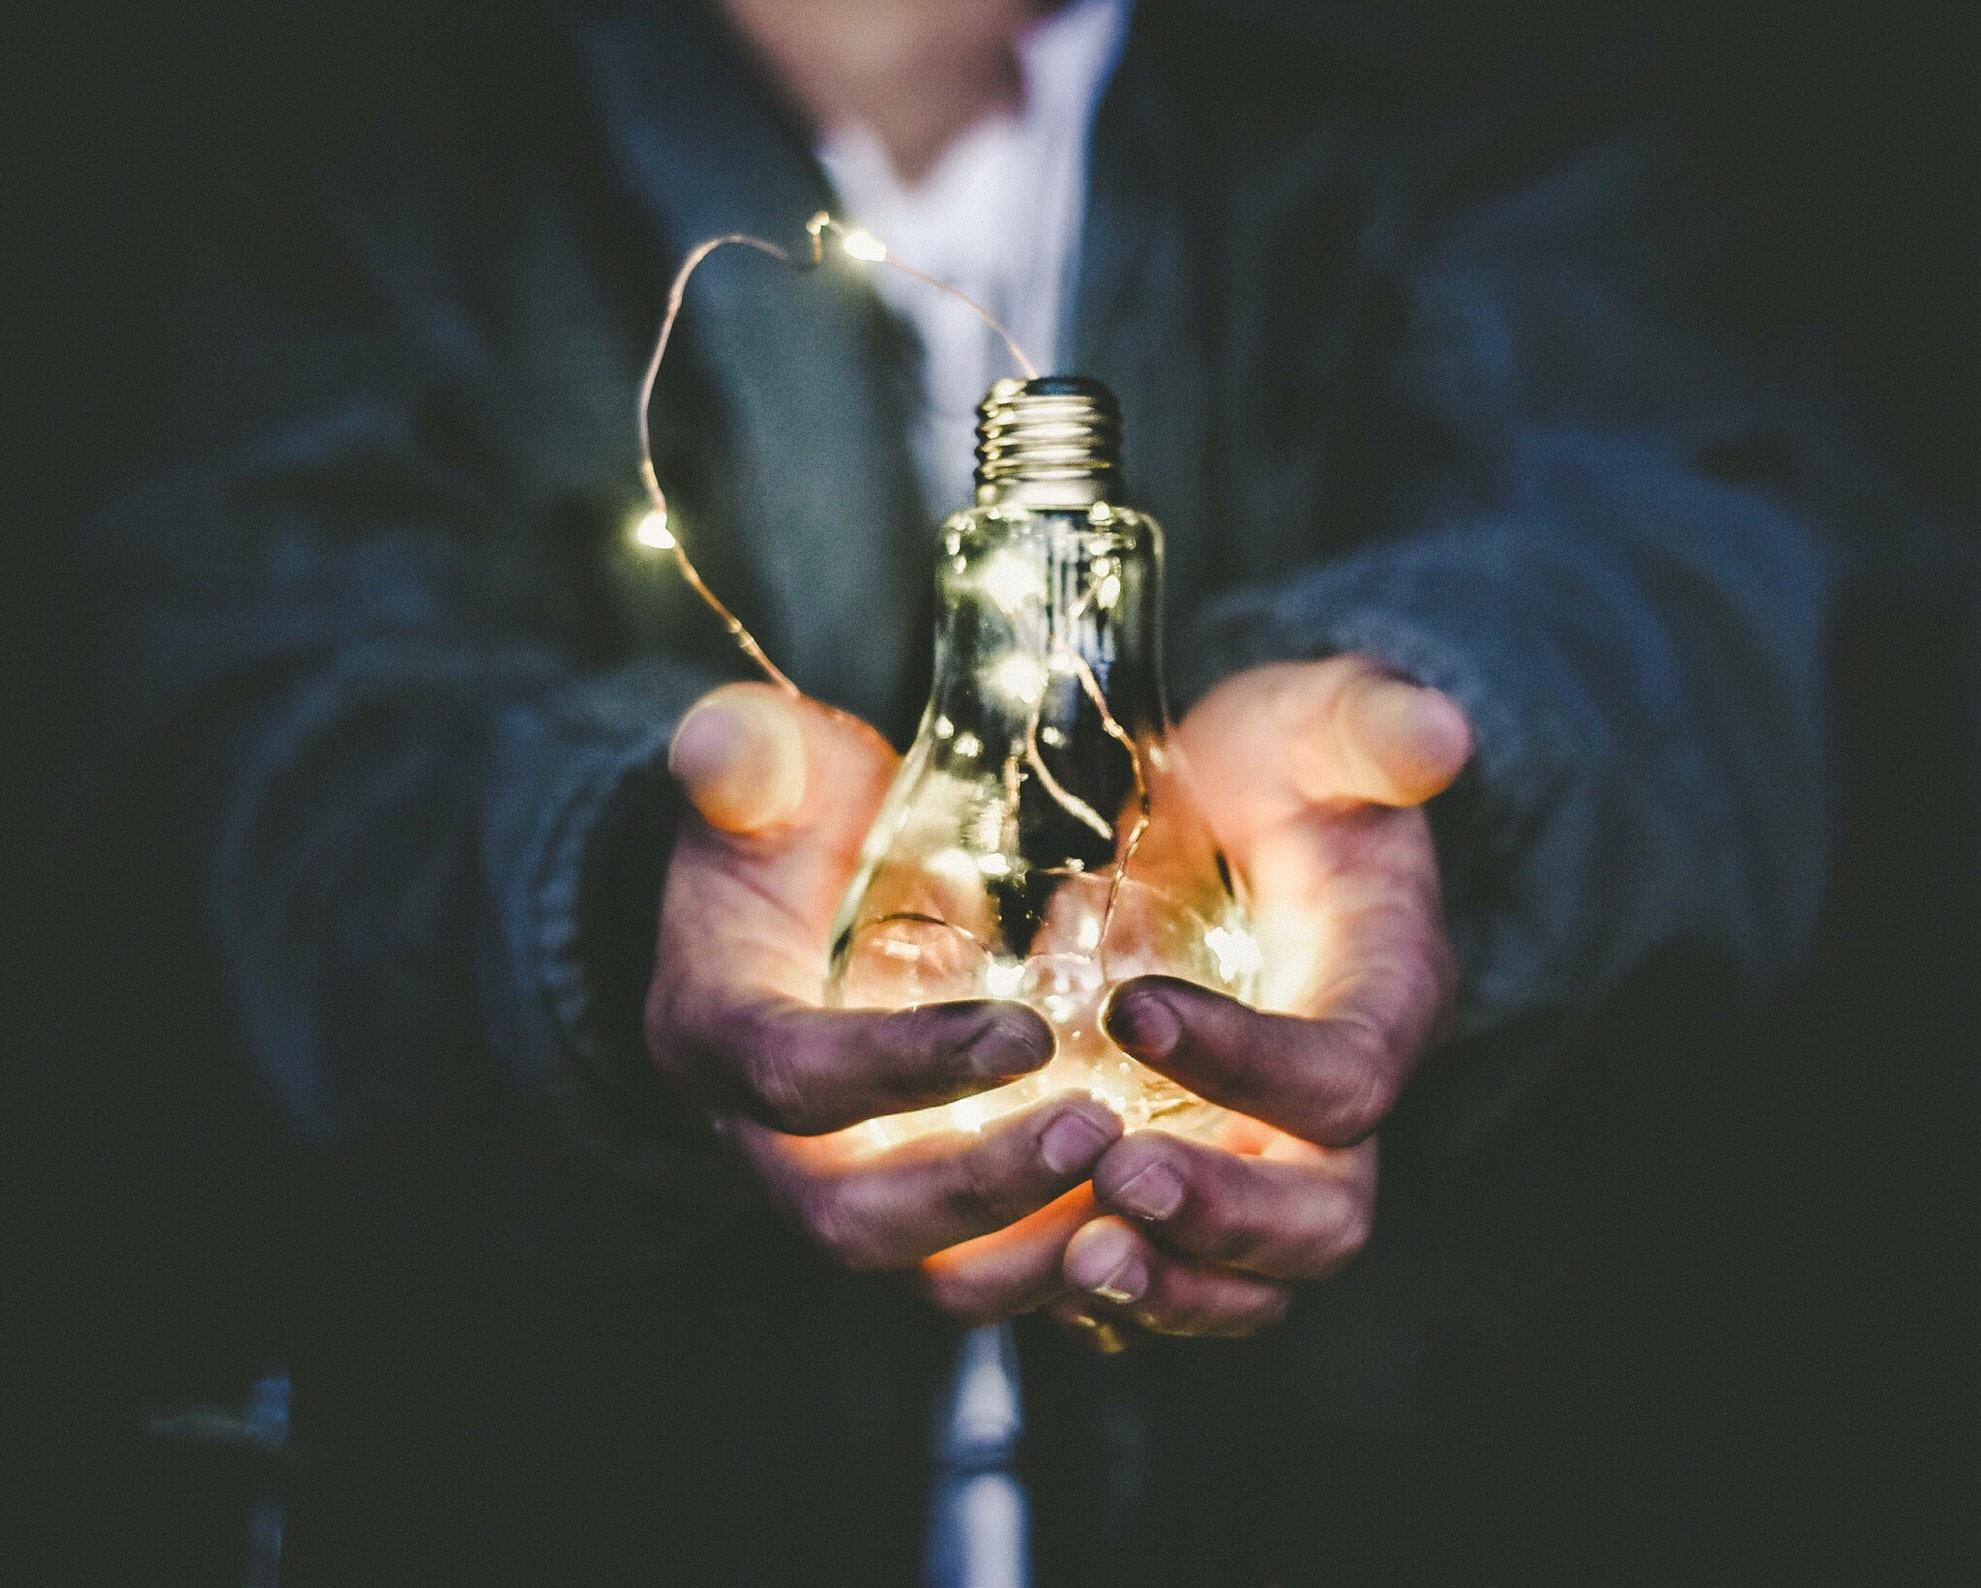 man holding incandescent bulb photo